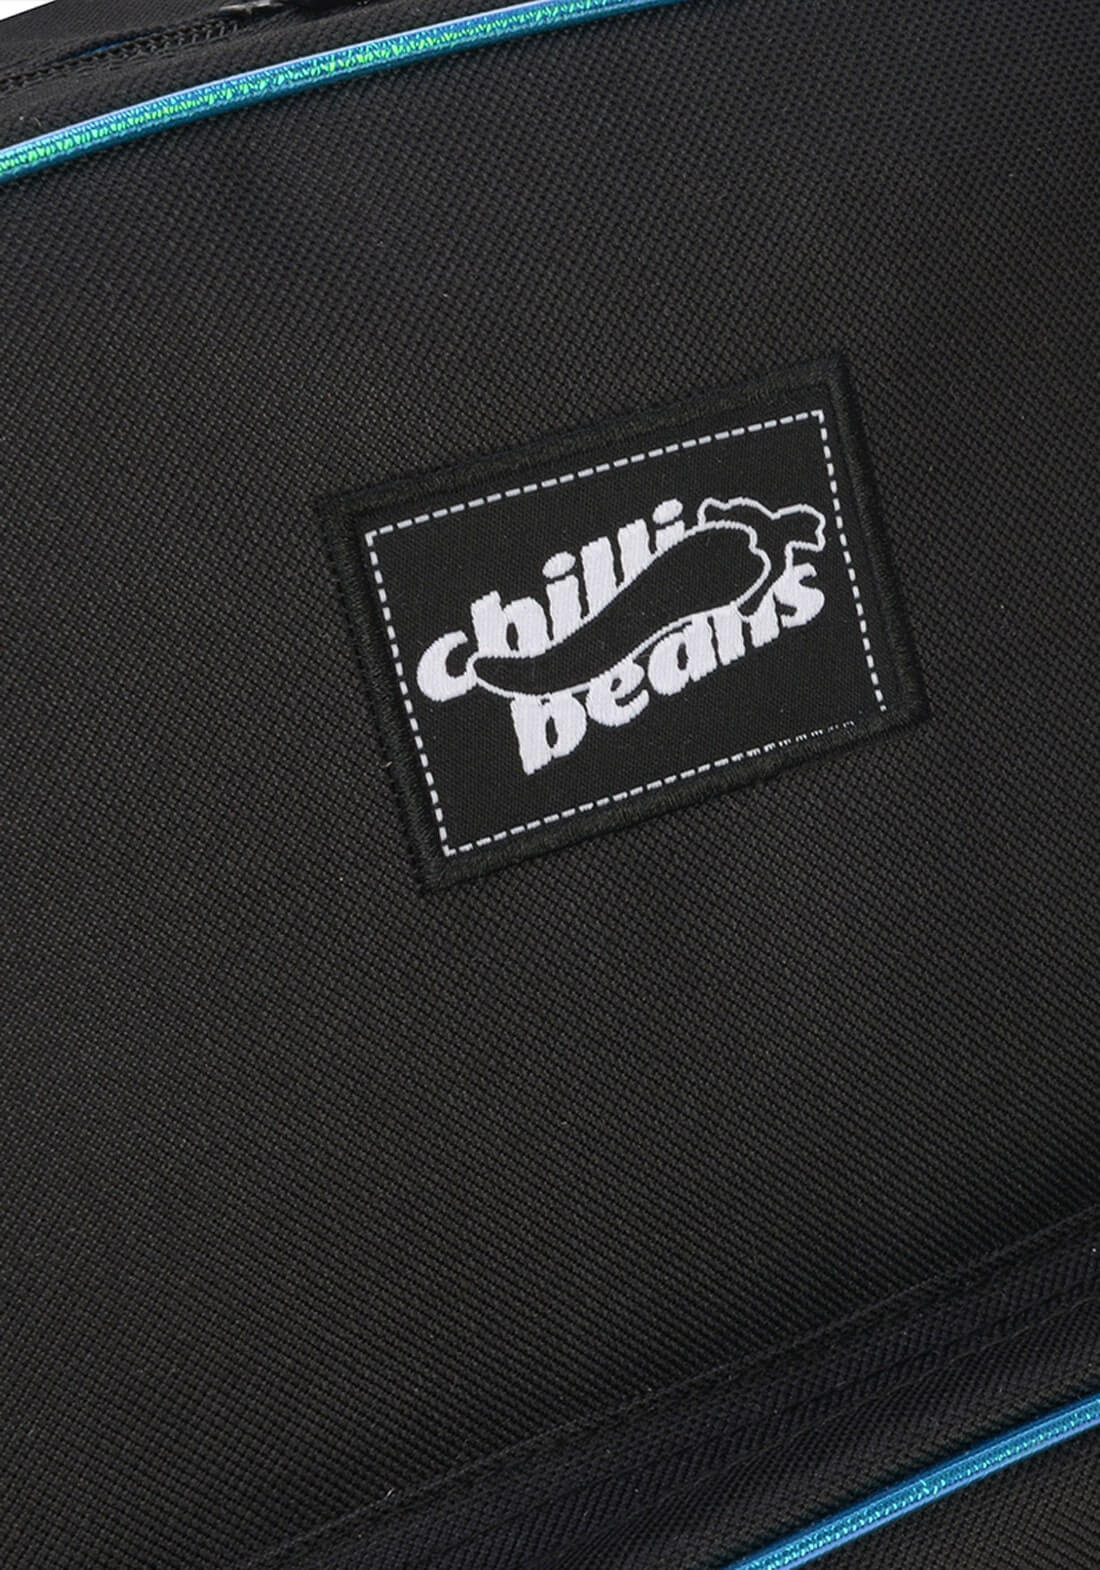 Mochila Notebook Costas Preta Chilli Beans Produto Original